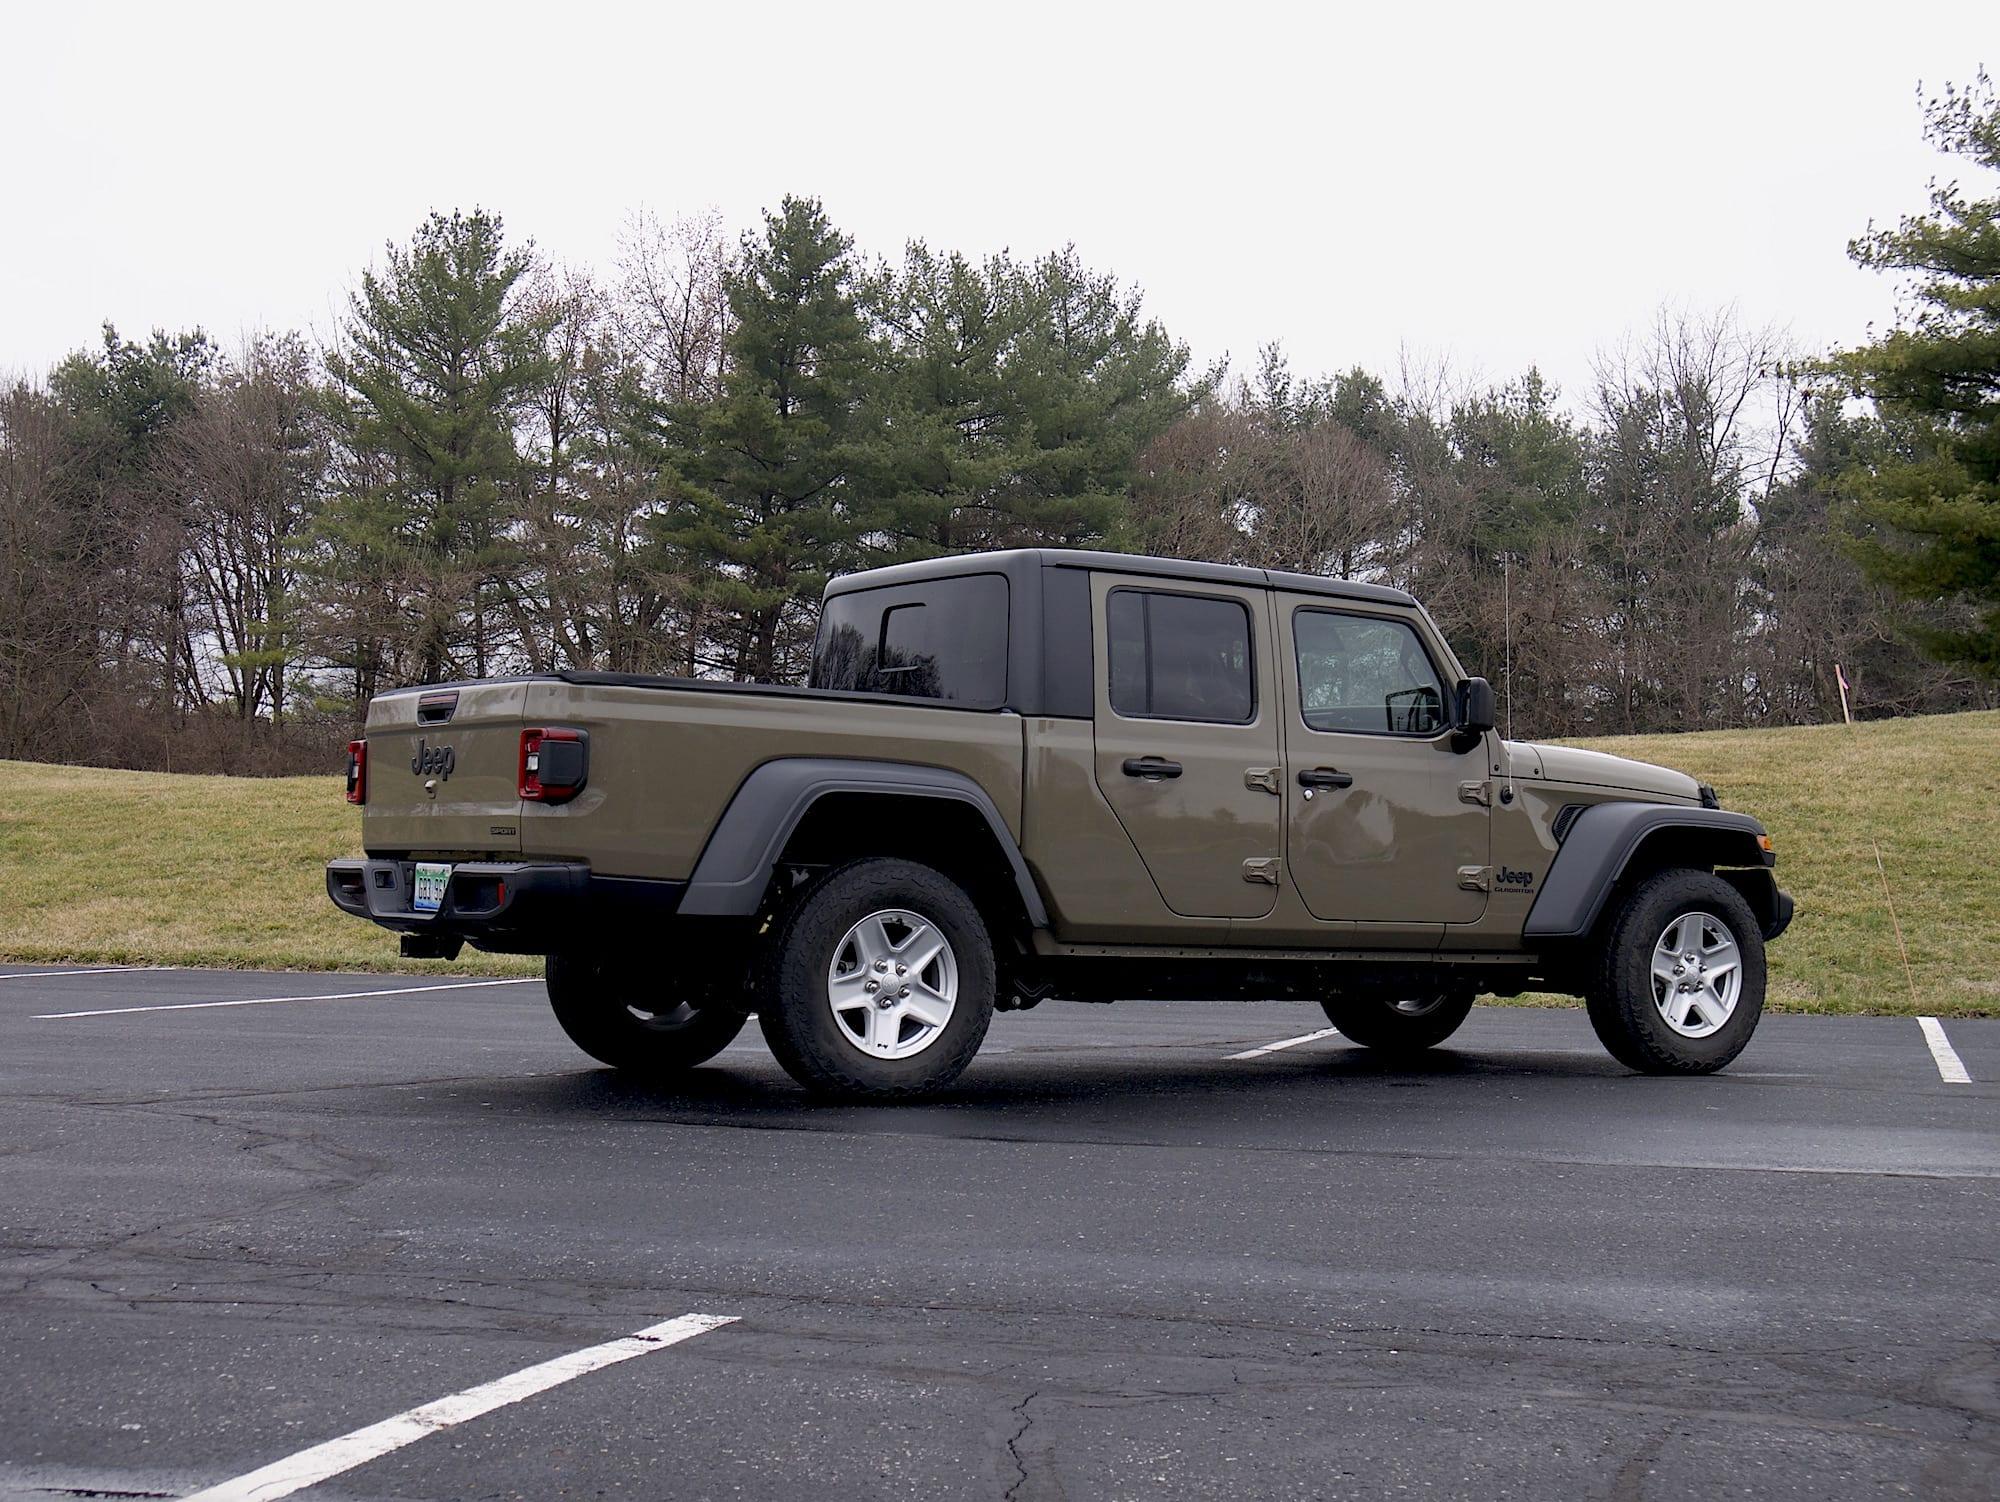 2020 Jeep Gladiator rear three quarter